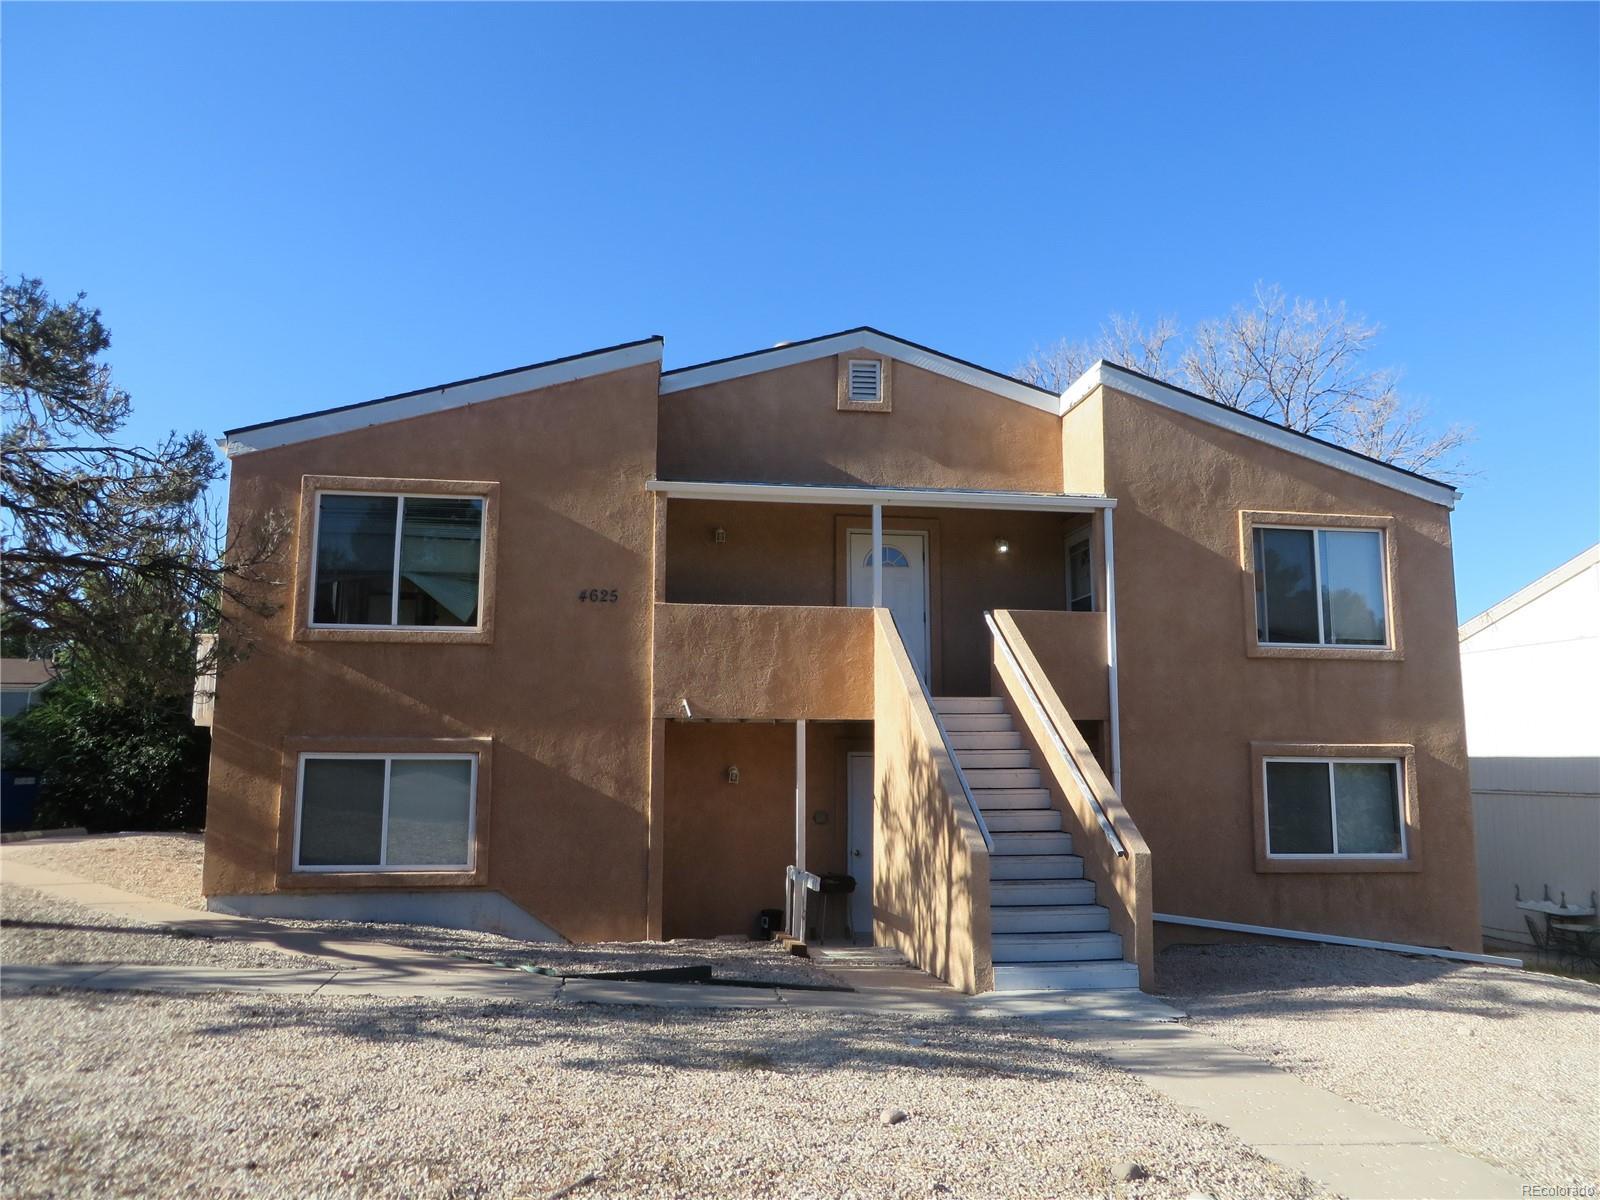 4625 N Carefree Circle, Colorado Springs, CO 80917 - Colorado Springs, CO real estate listing